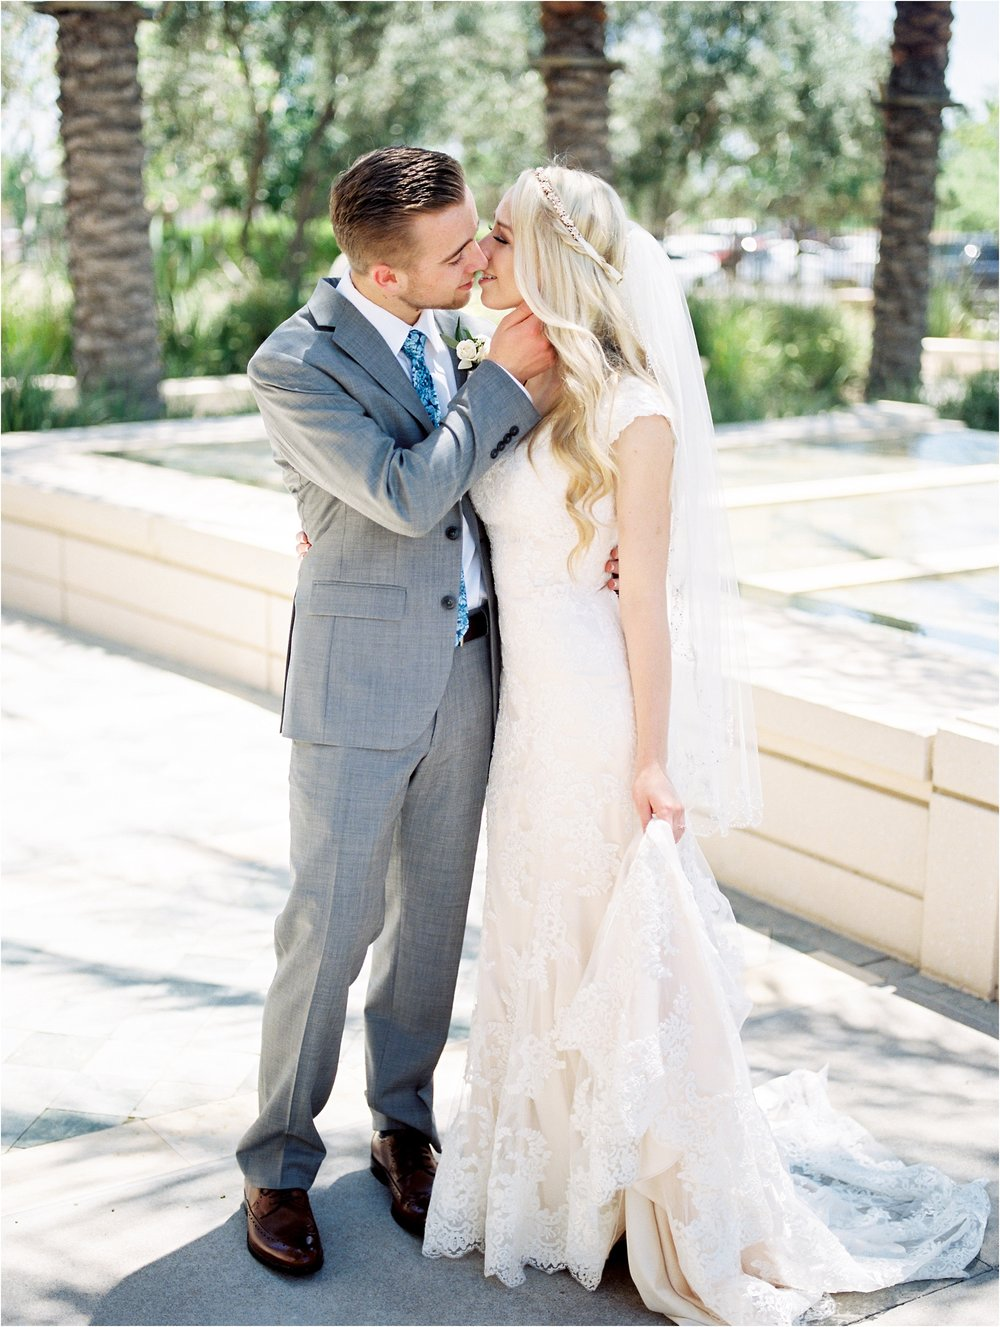 Sarah Jane Photography Film Hybrid Scottsdale Phoenix Arizona Destination Wedding Photographer Julie ans Mason_0015.jpg